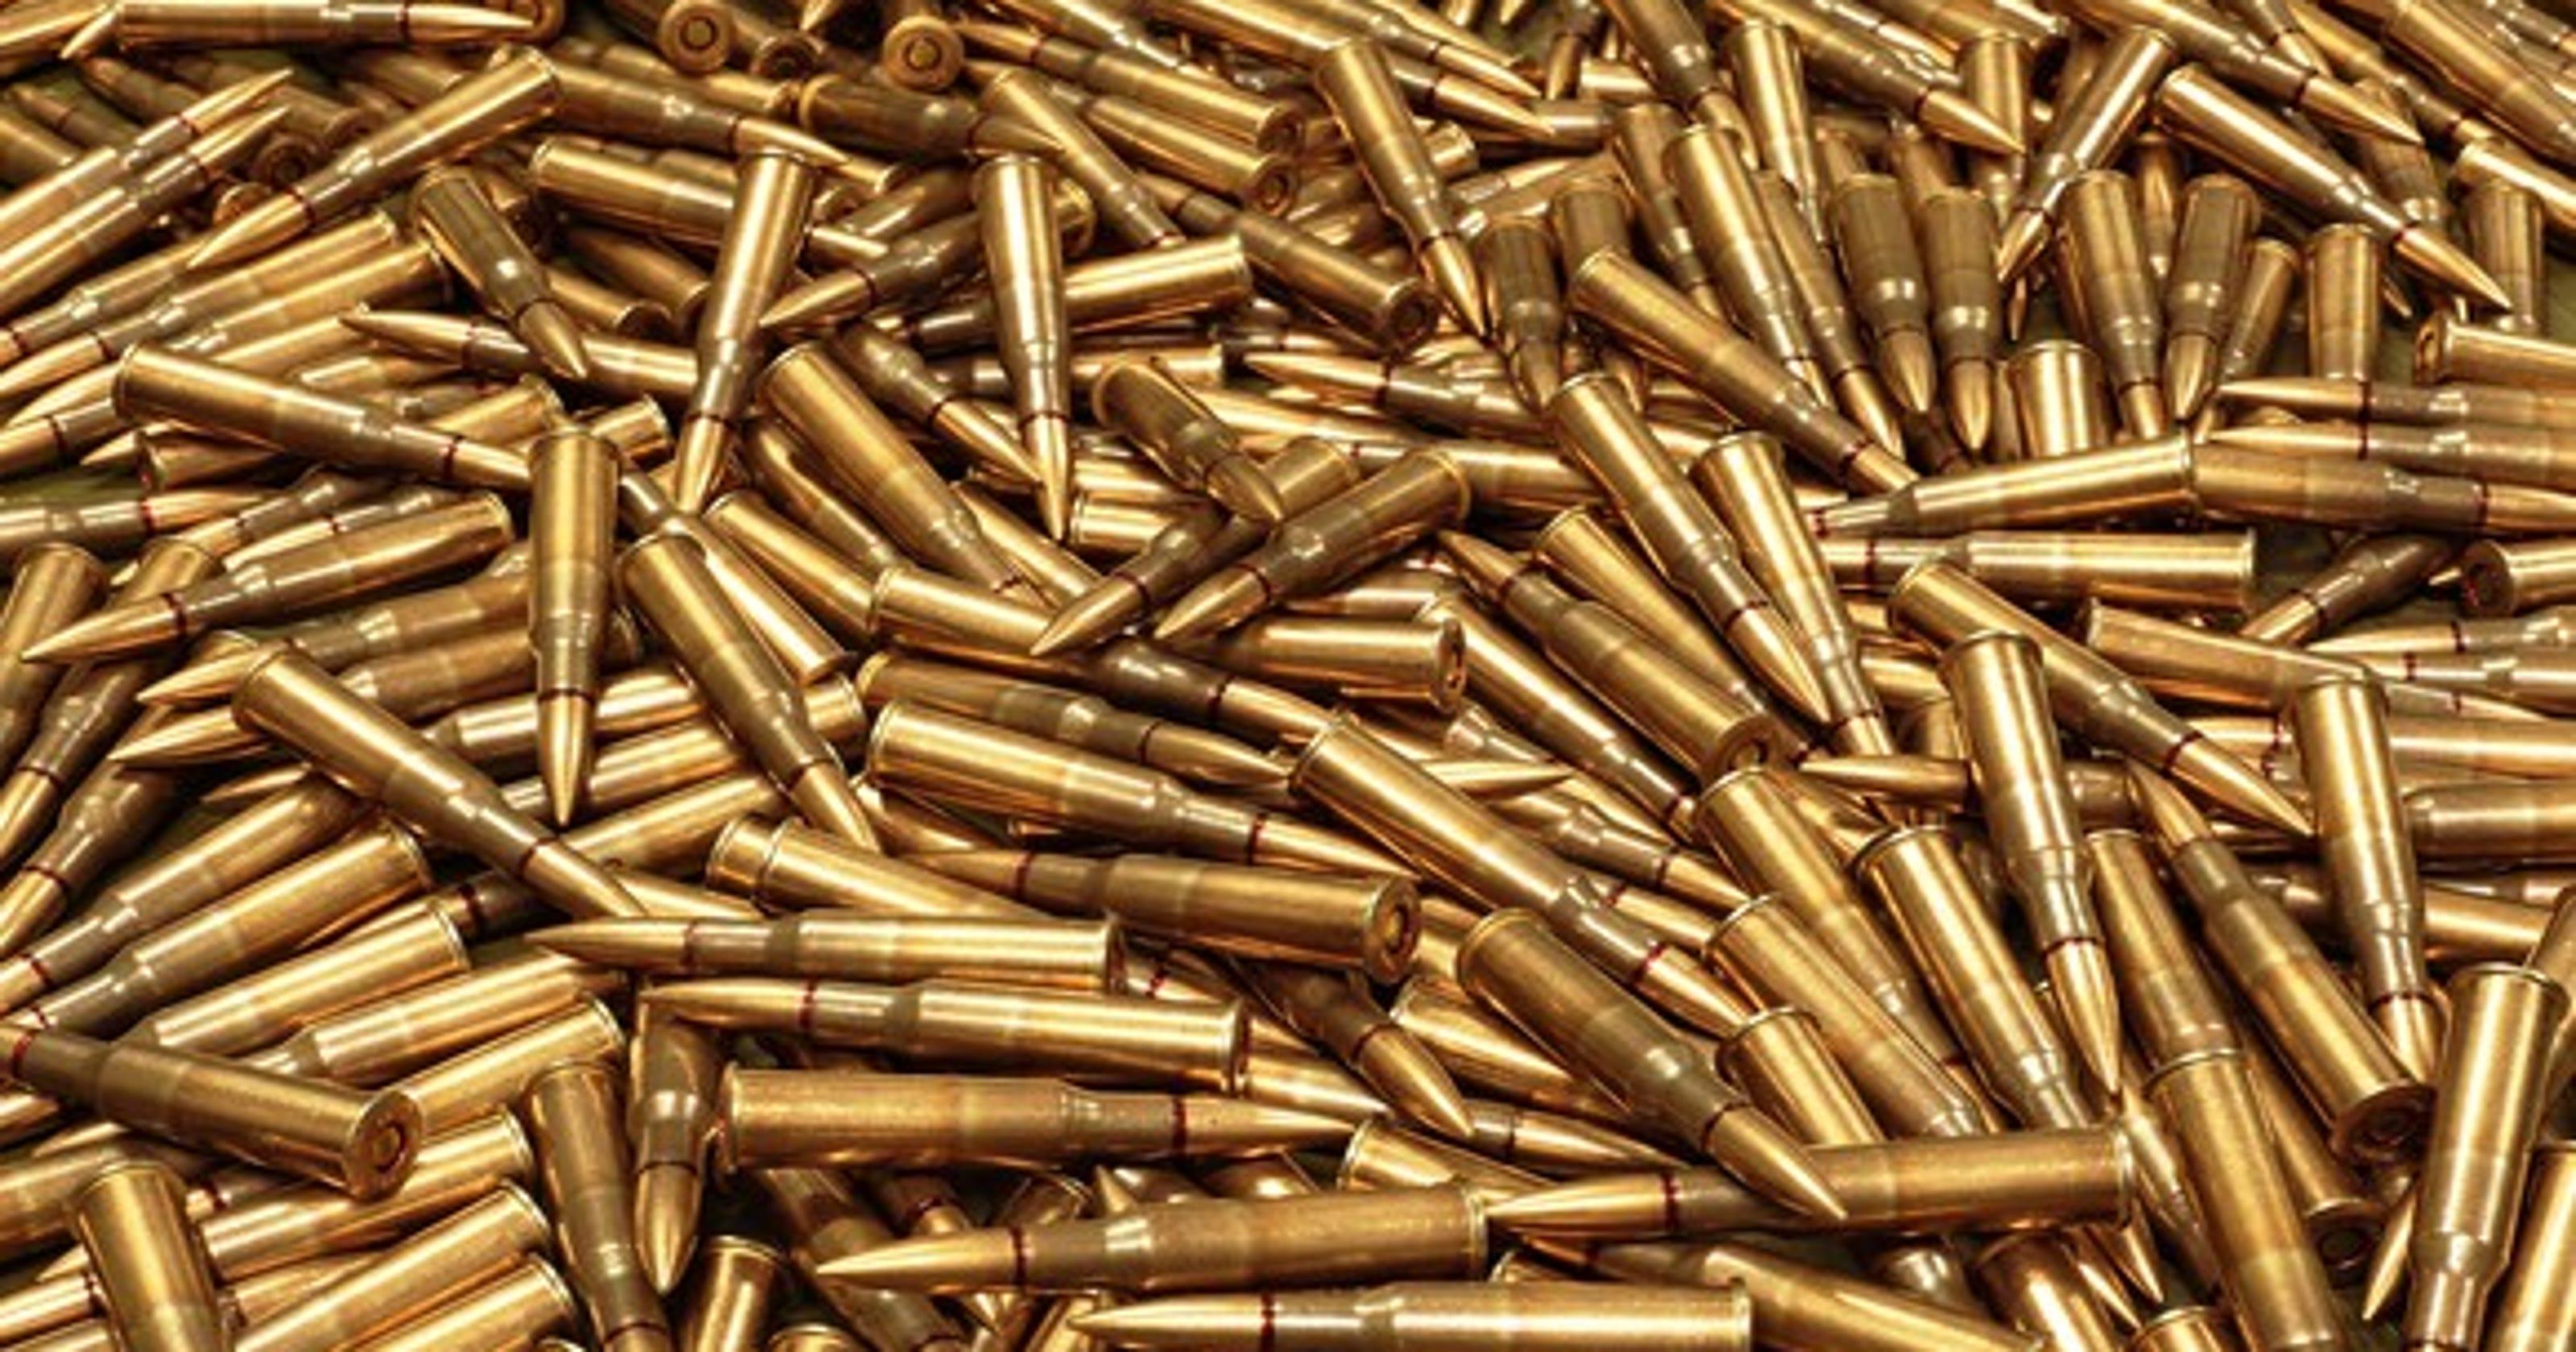 new jersey gun control ammunition limits challenged in court